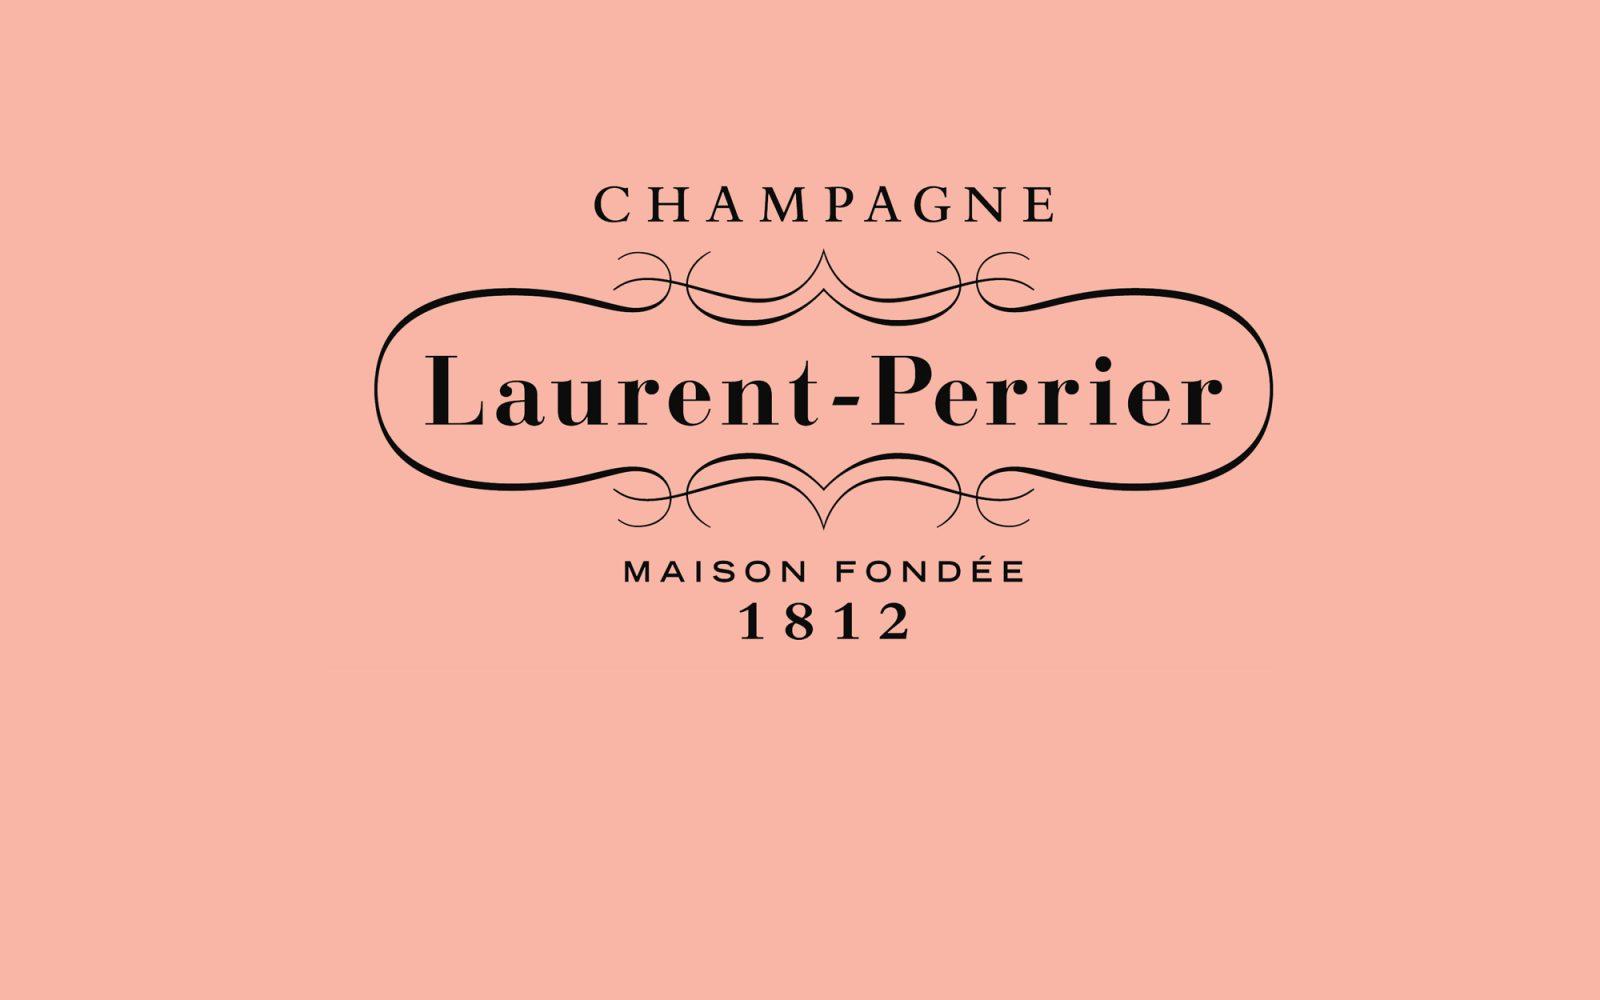 Laurent Perrier logo on pink background